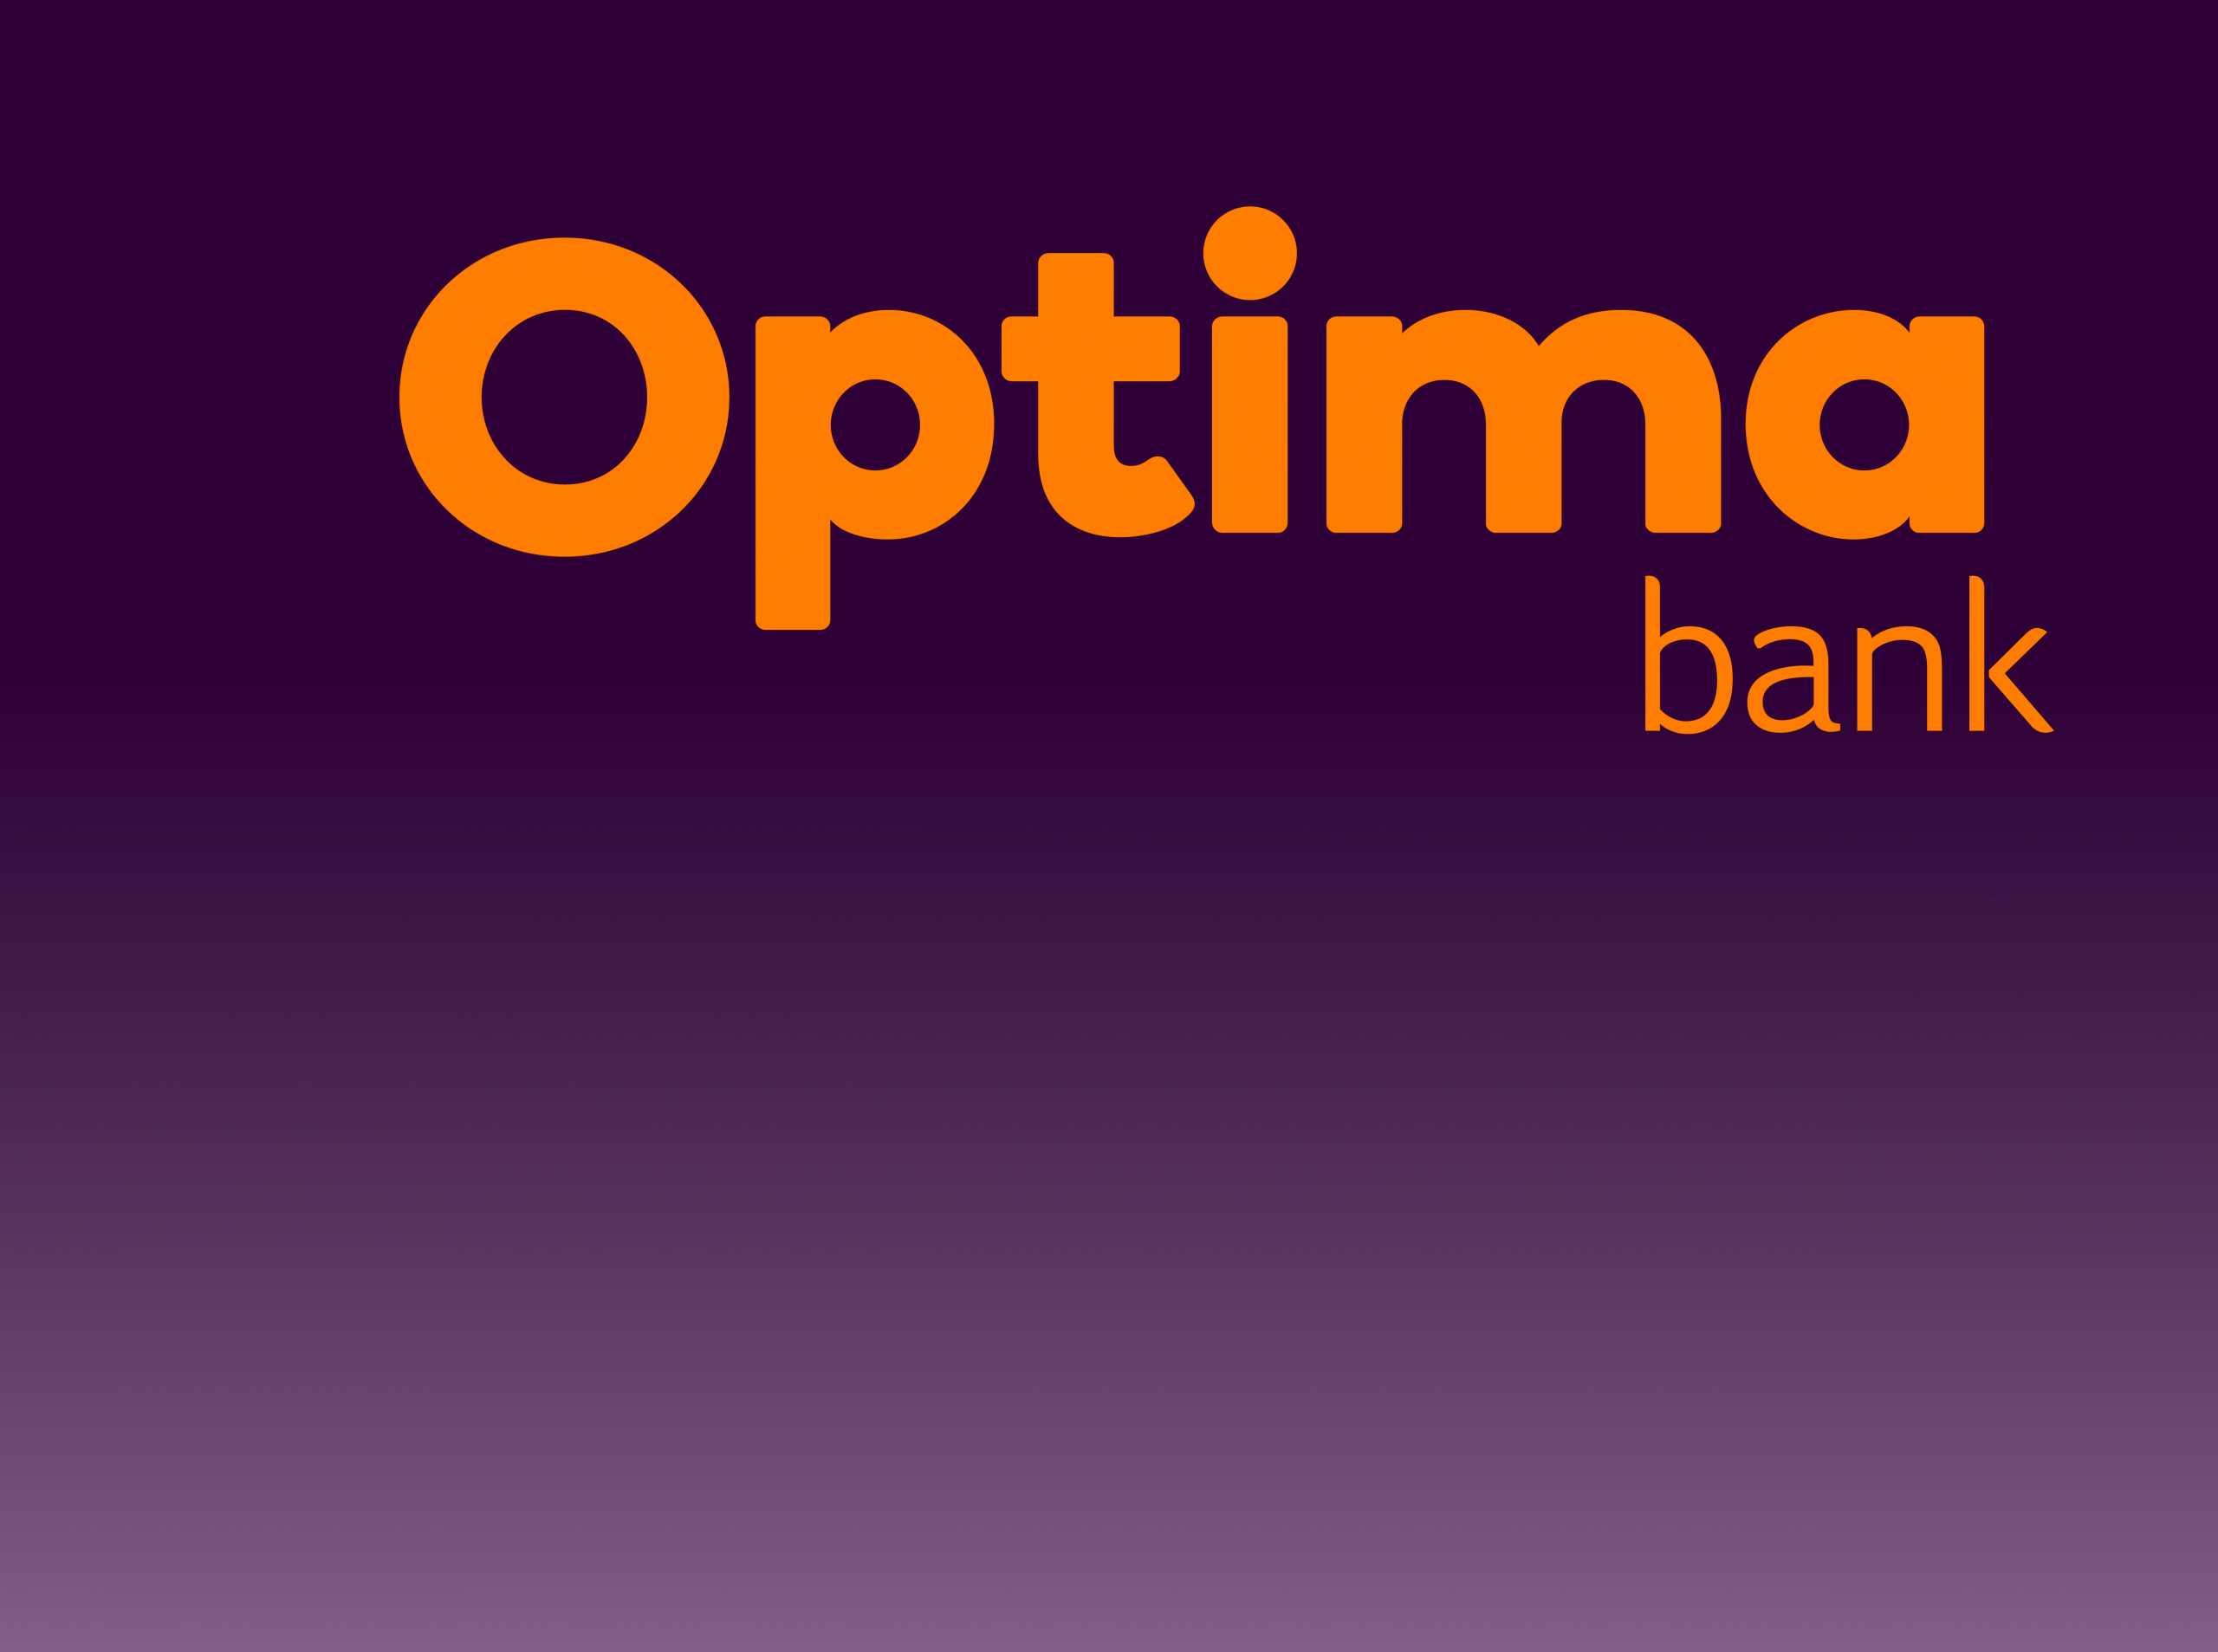 Optima bank: Διπλασίασε το μετοχικό κεφάλαιο με τη συμμετοχή της οικογένειας Βαρδινογιάννη και άλλων επενδυτών